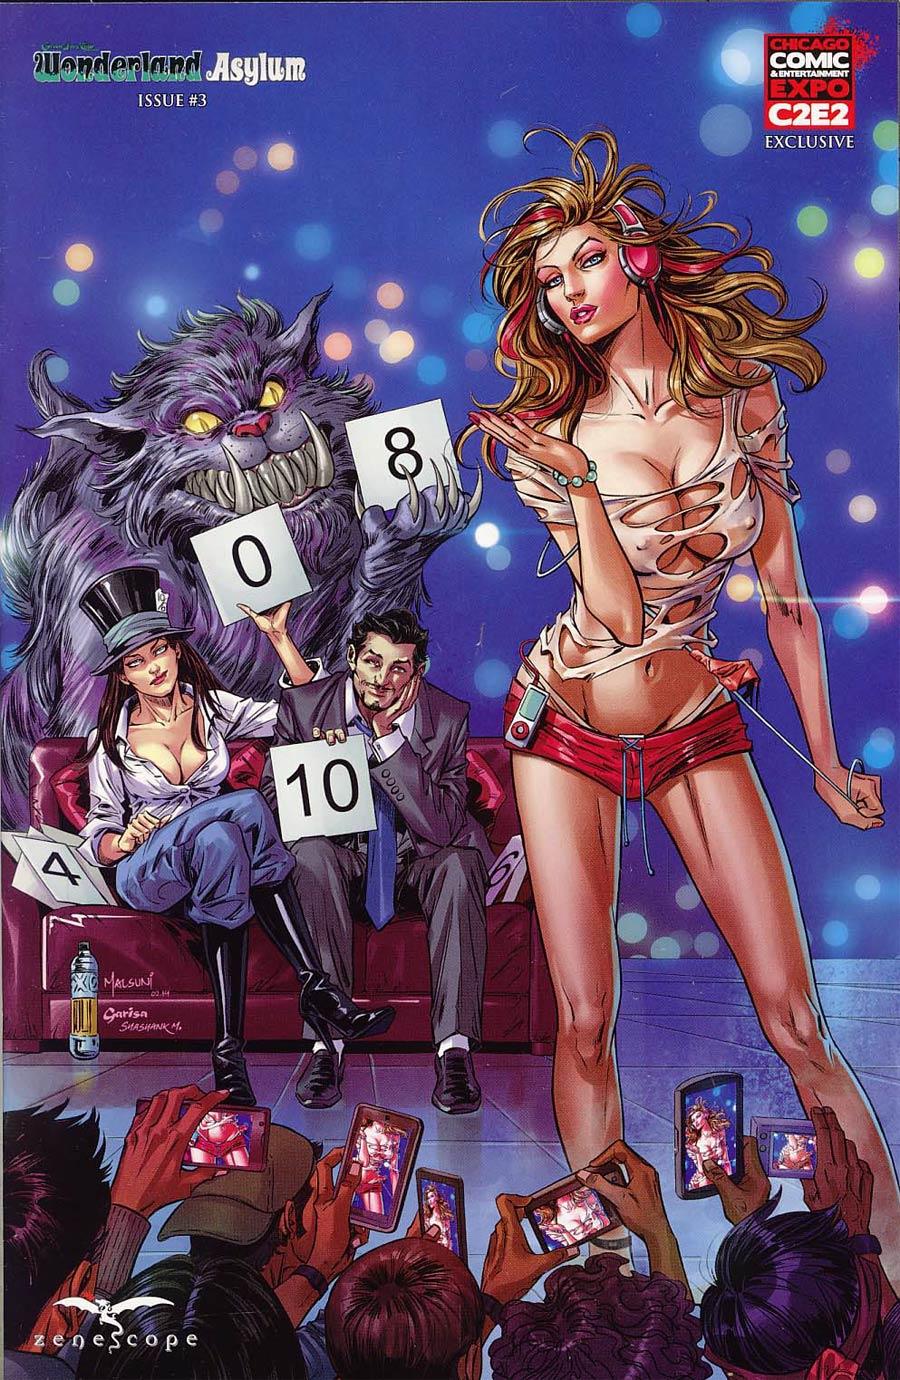 Grimm Fairy Tales Presents Wonderland Asylum #3 Cover D C2E2 Exclusive Abhishek Malsuni Variant Cover